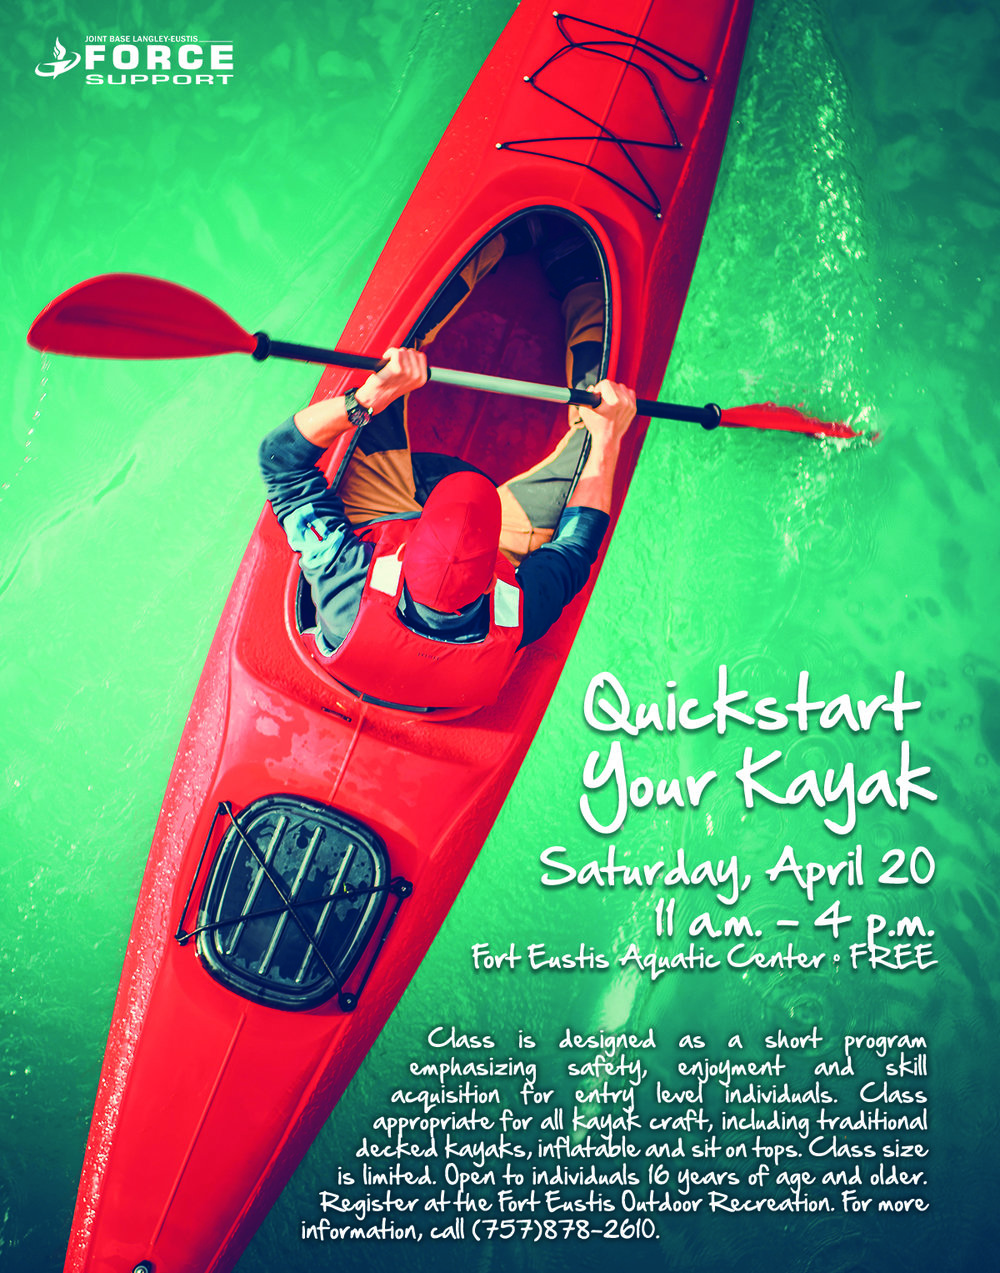 04-19 Quickstart Your Kayak.jpg